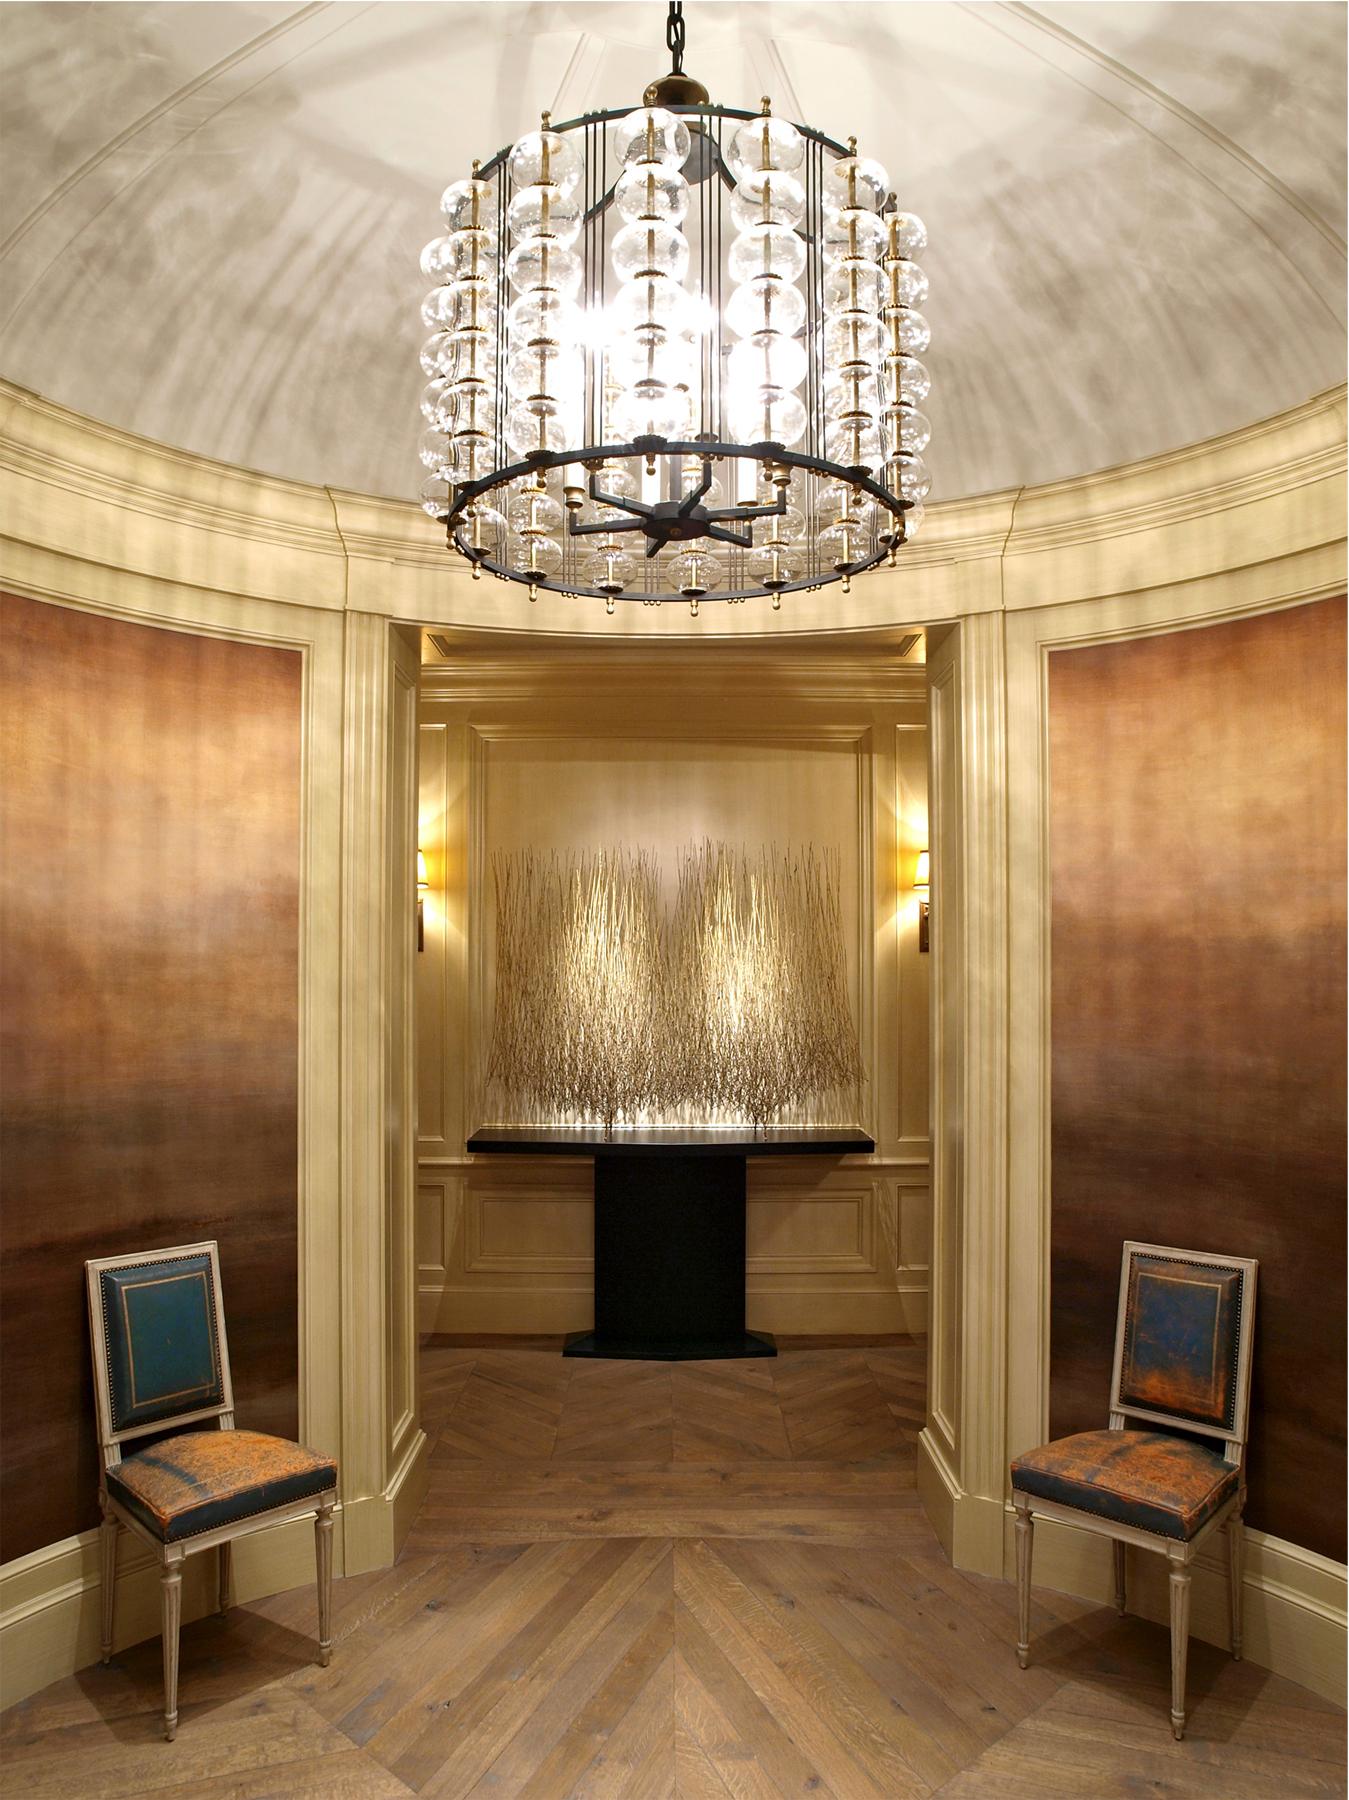 Private Collector | Design Firm: Jessica Lagrange Interiors Artist: Harry Bertoia